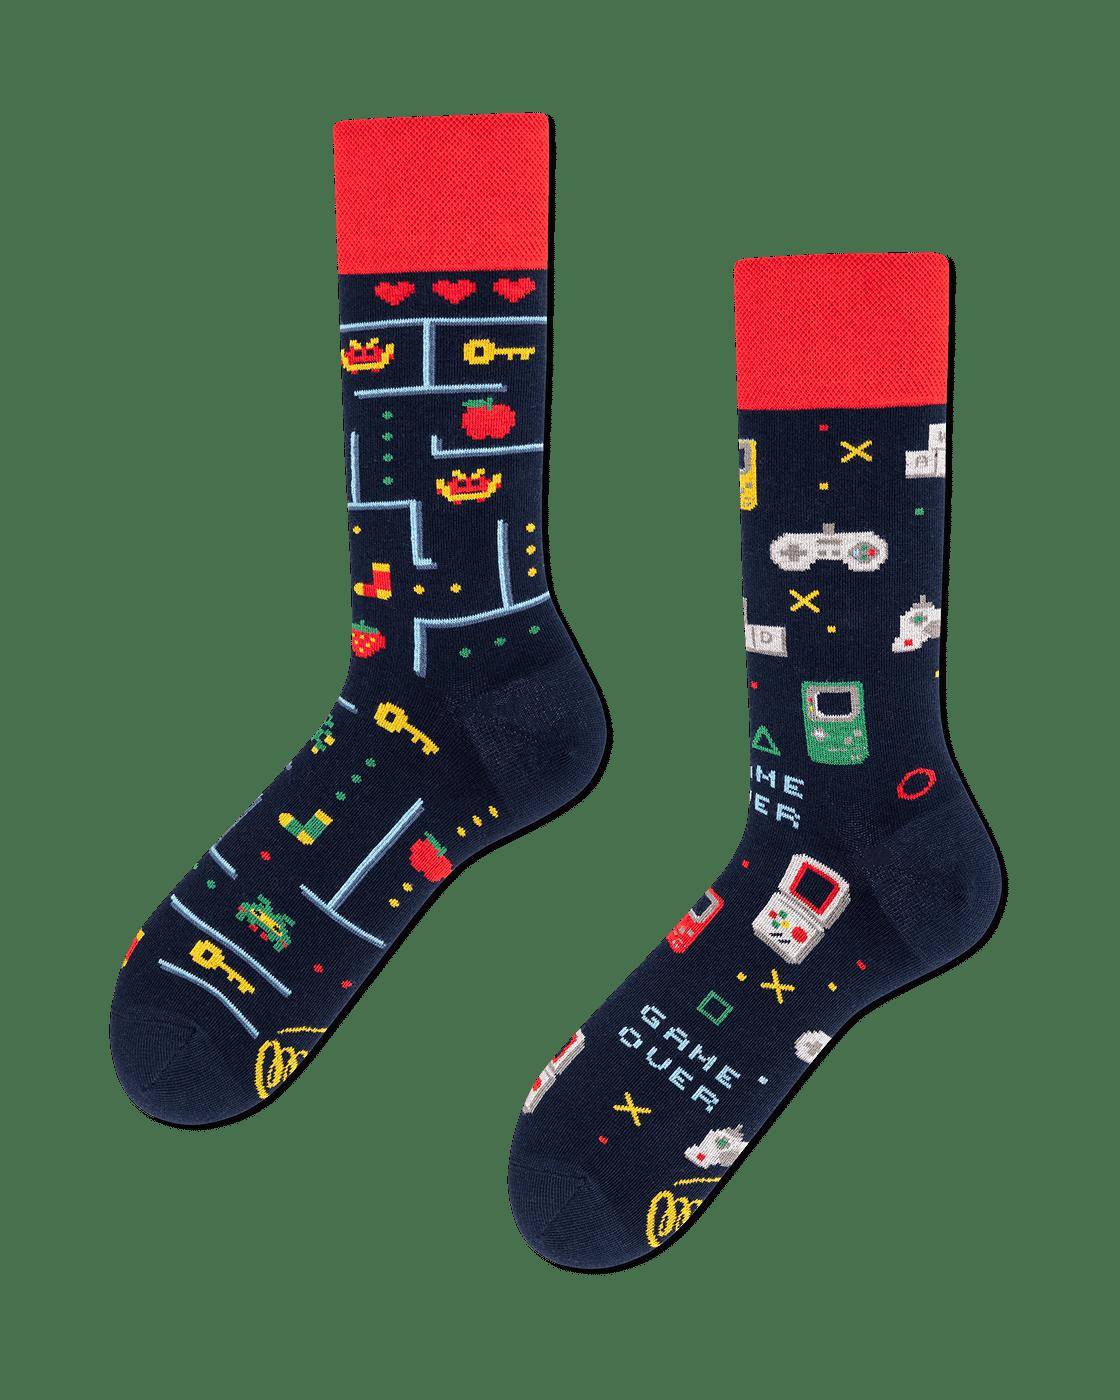 GAME OVER - Chaussettes pour joueurs